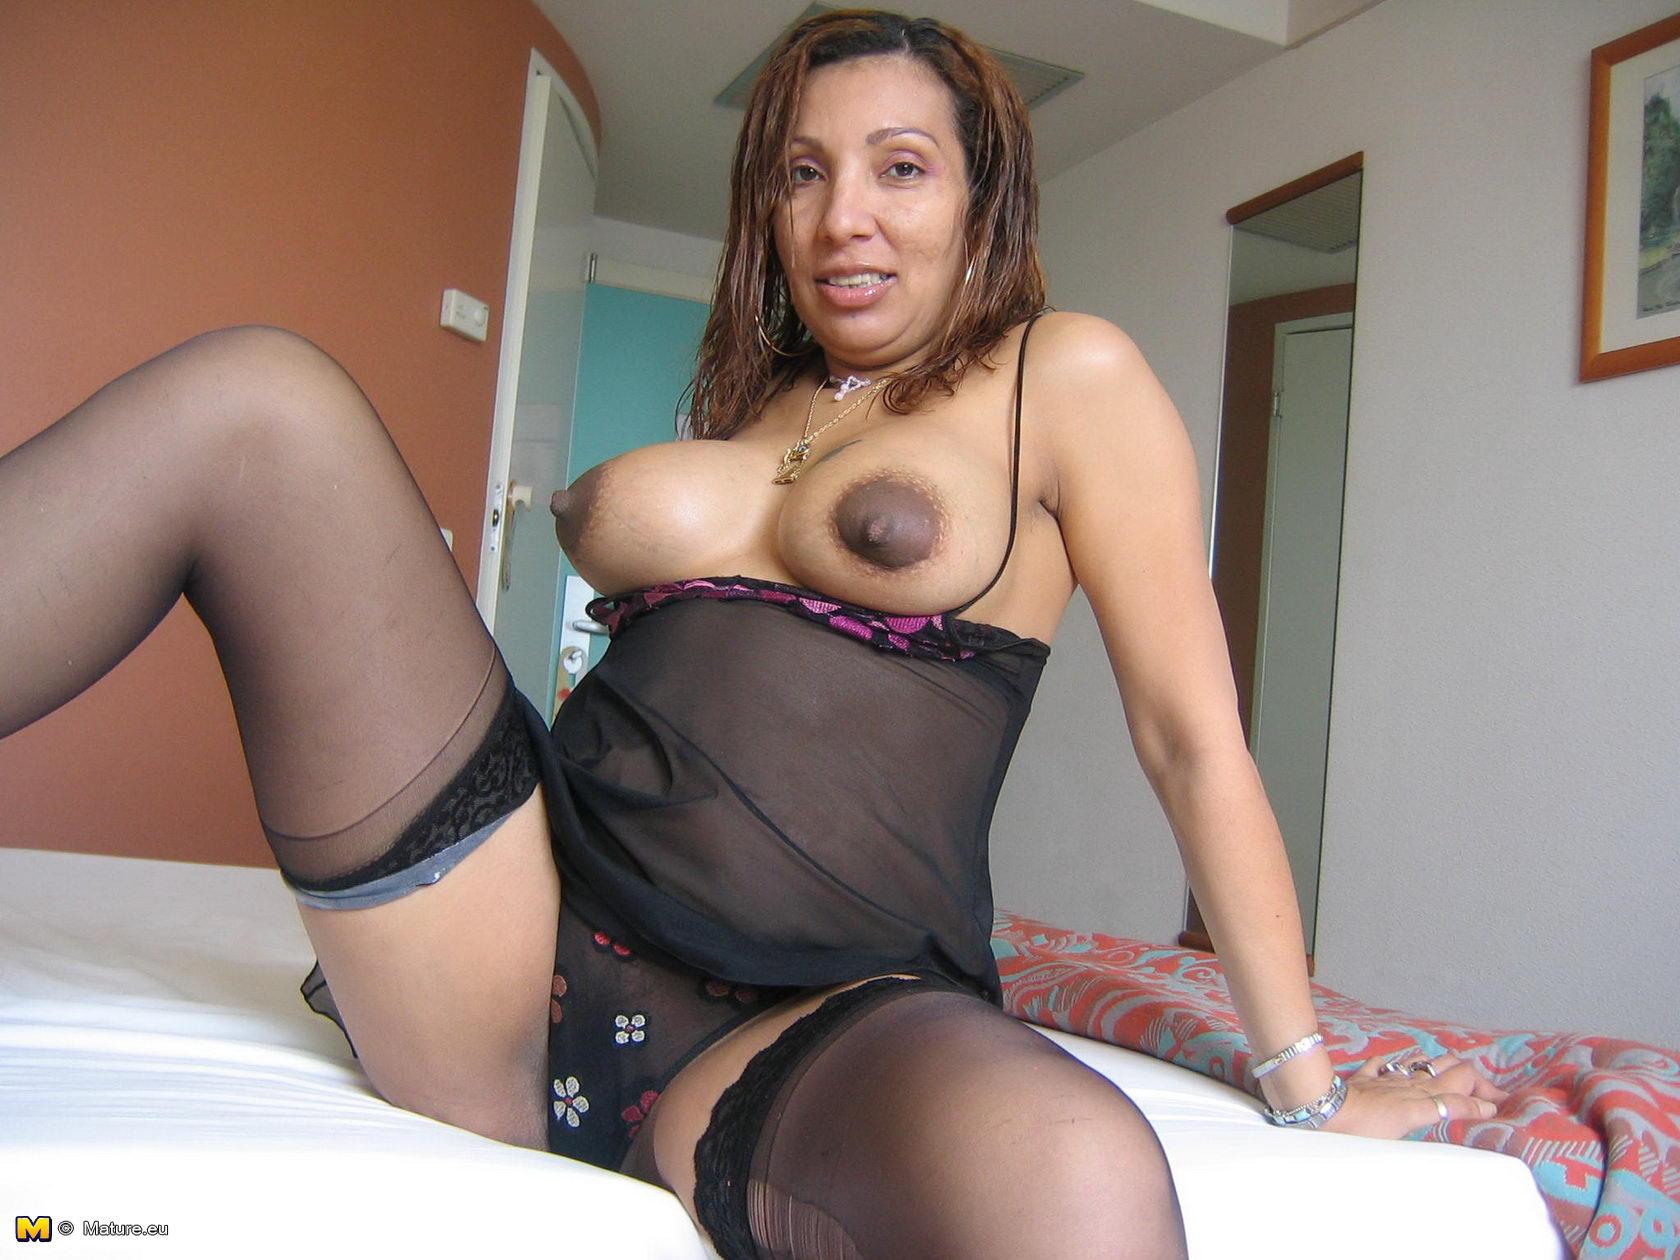 Arianny Celeste Actrix Porno mature.eu horny mature celeste loves playing with those toys